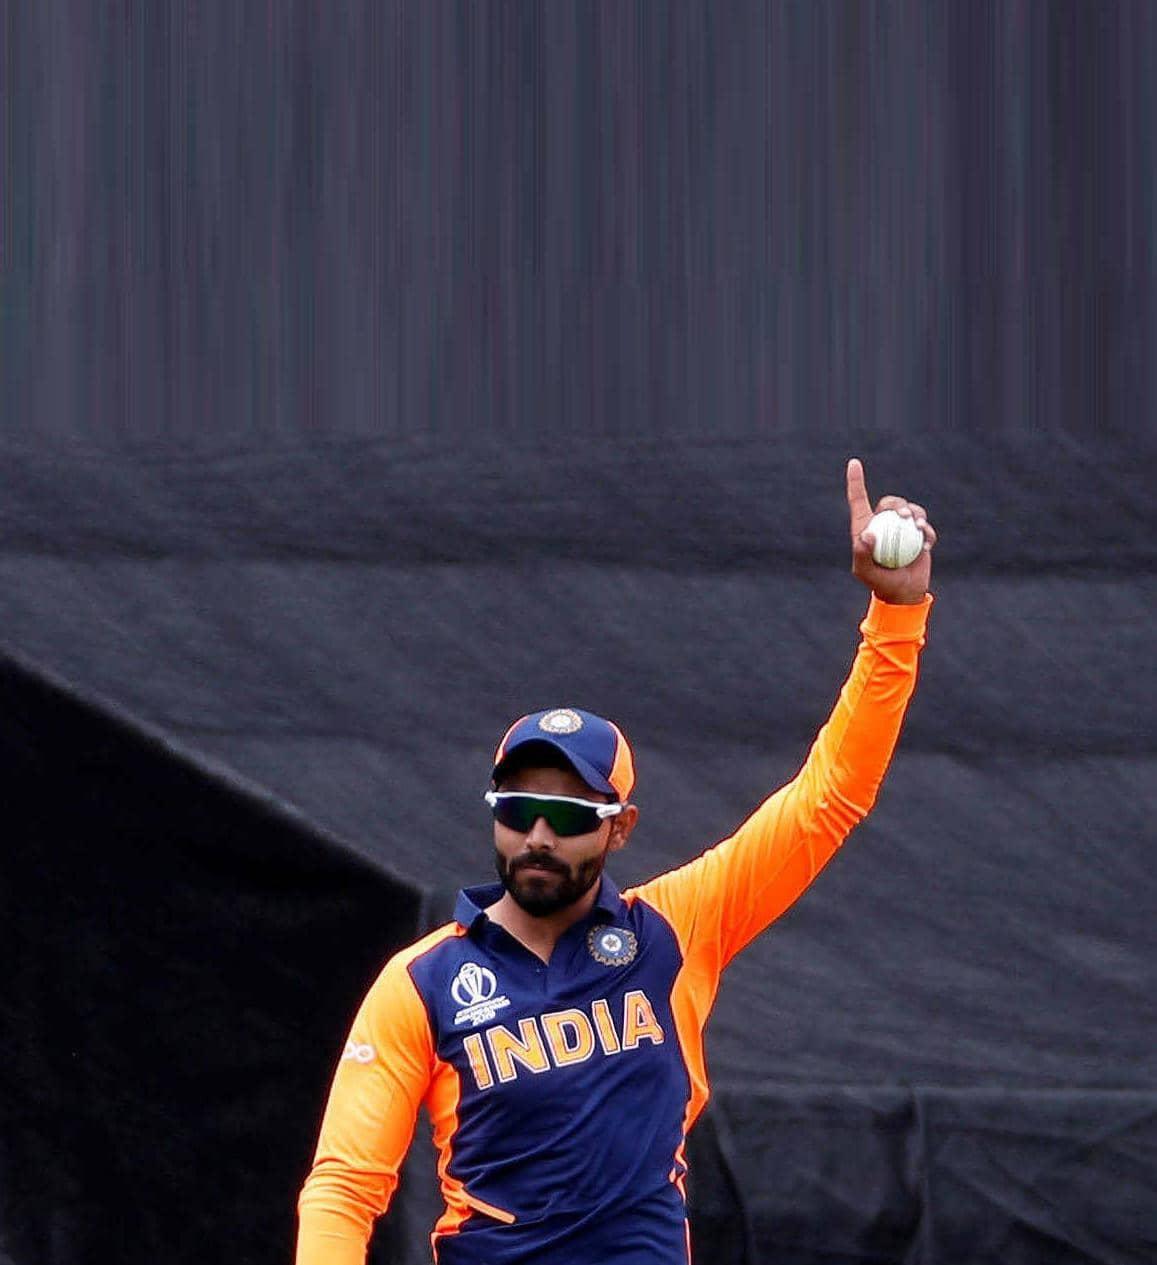 Is Ravindra Jadeja the best Indian fielder ever?